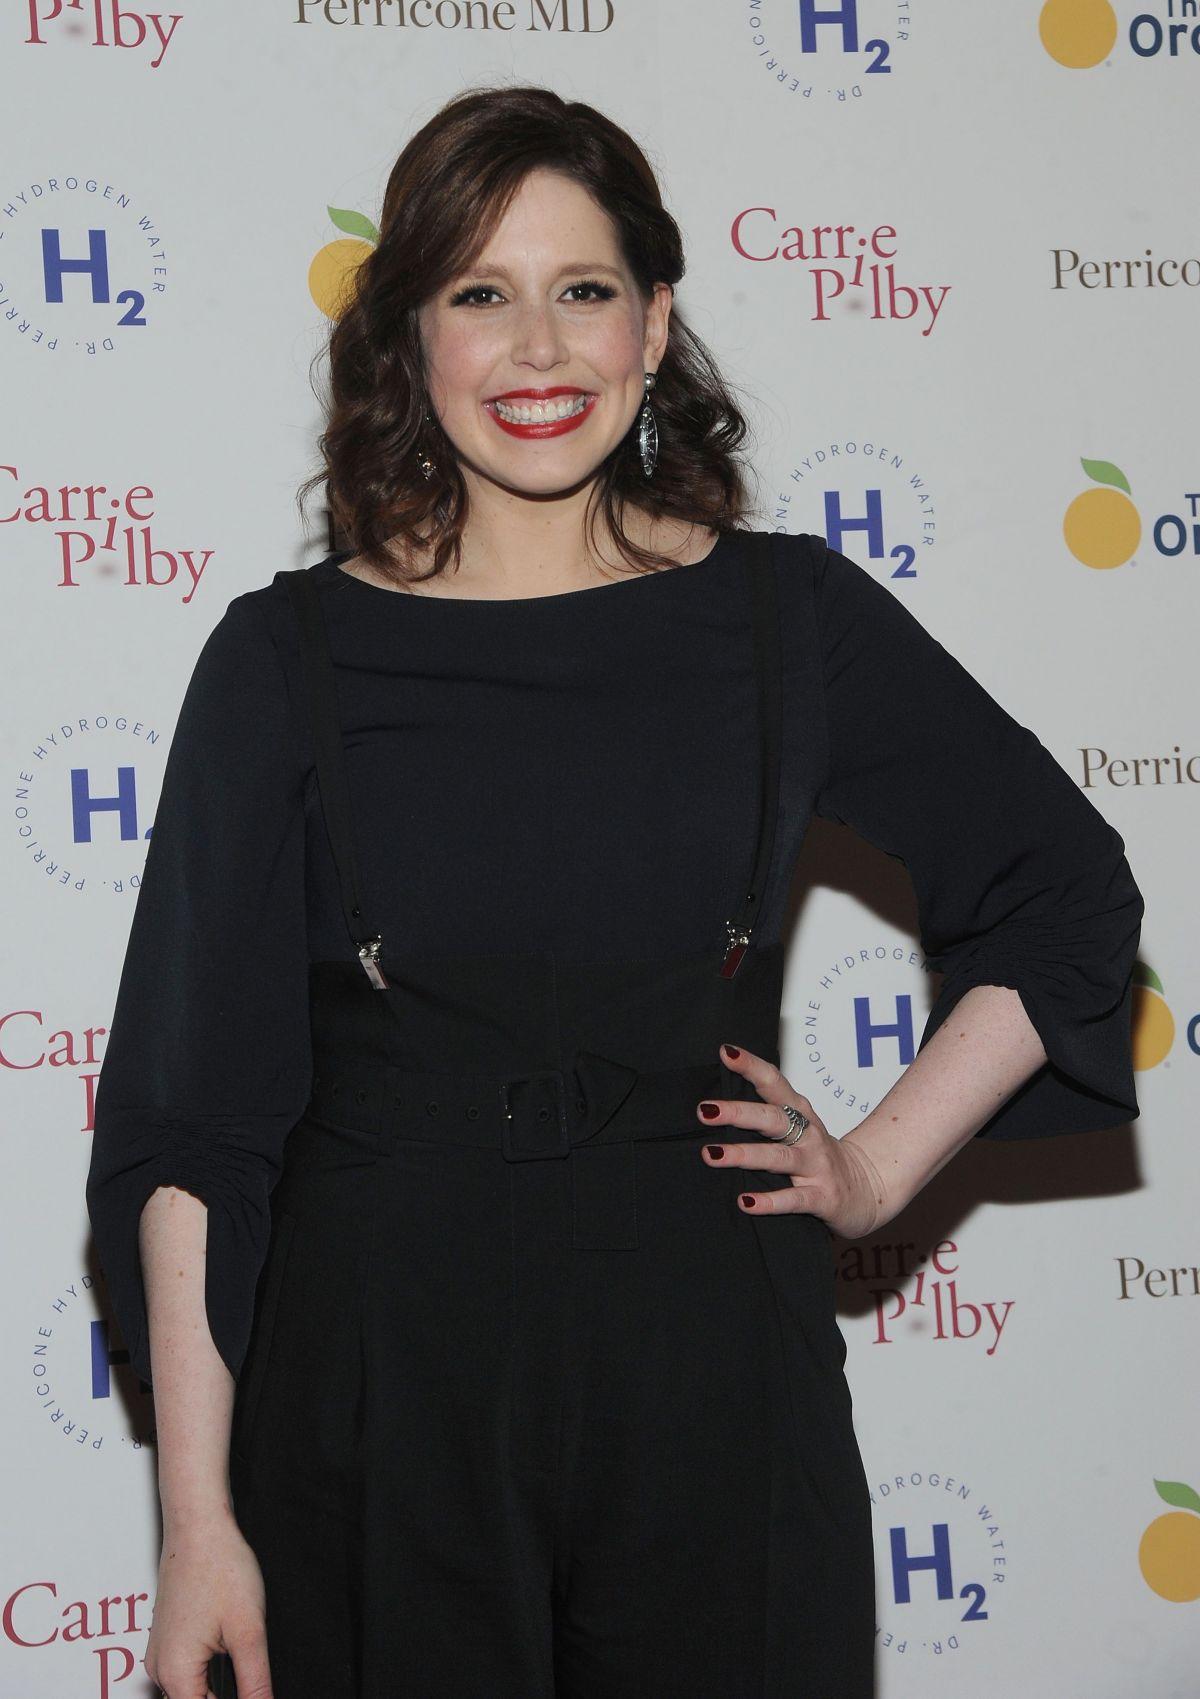 VANESSA BAYER at Carrie Pilby Screening New York 03/23/2017